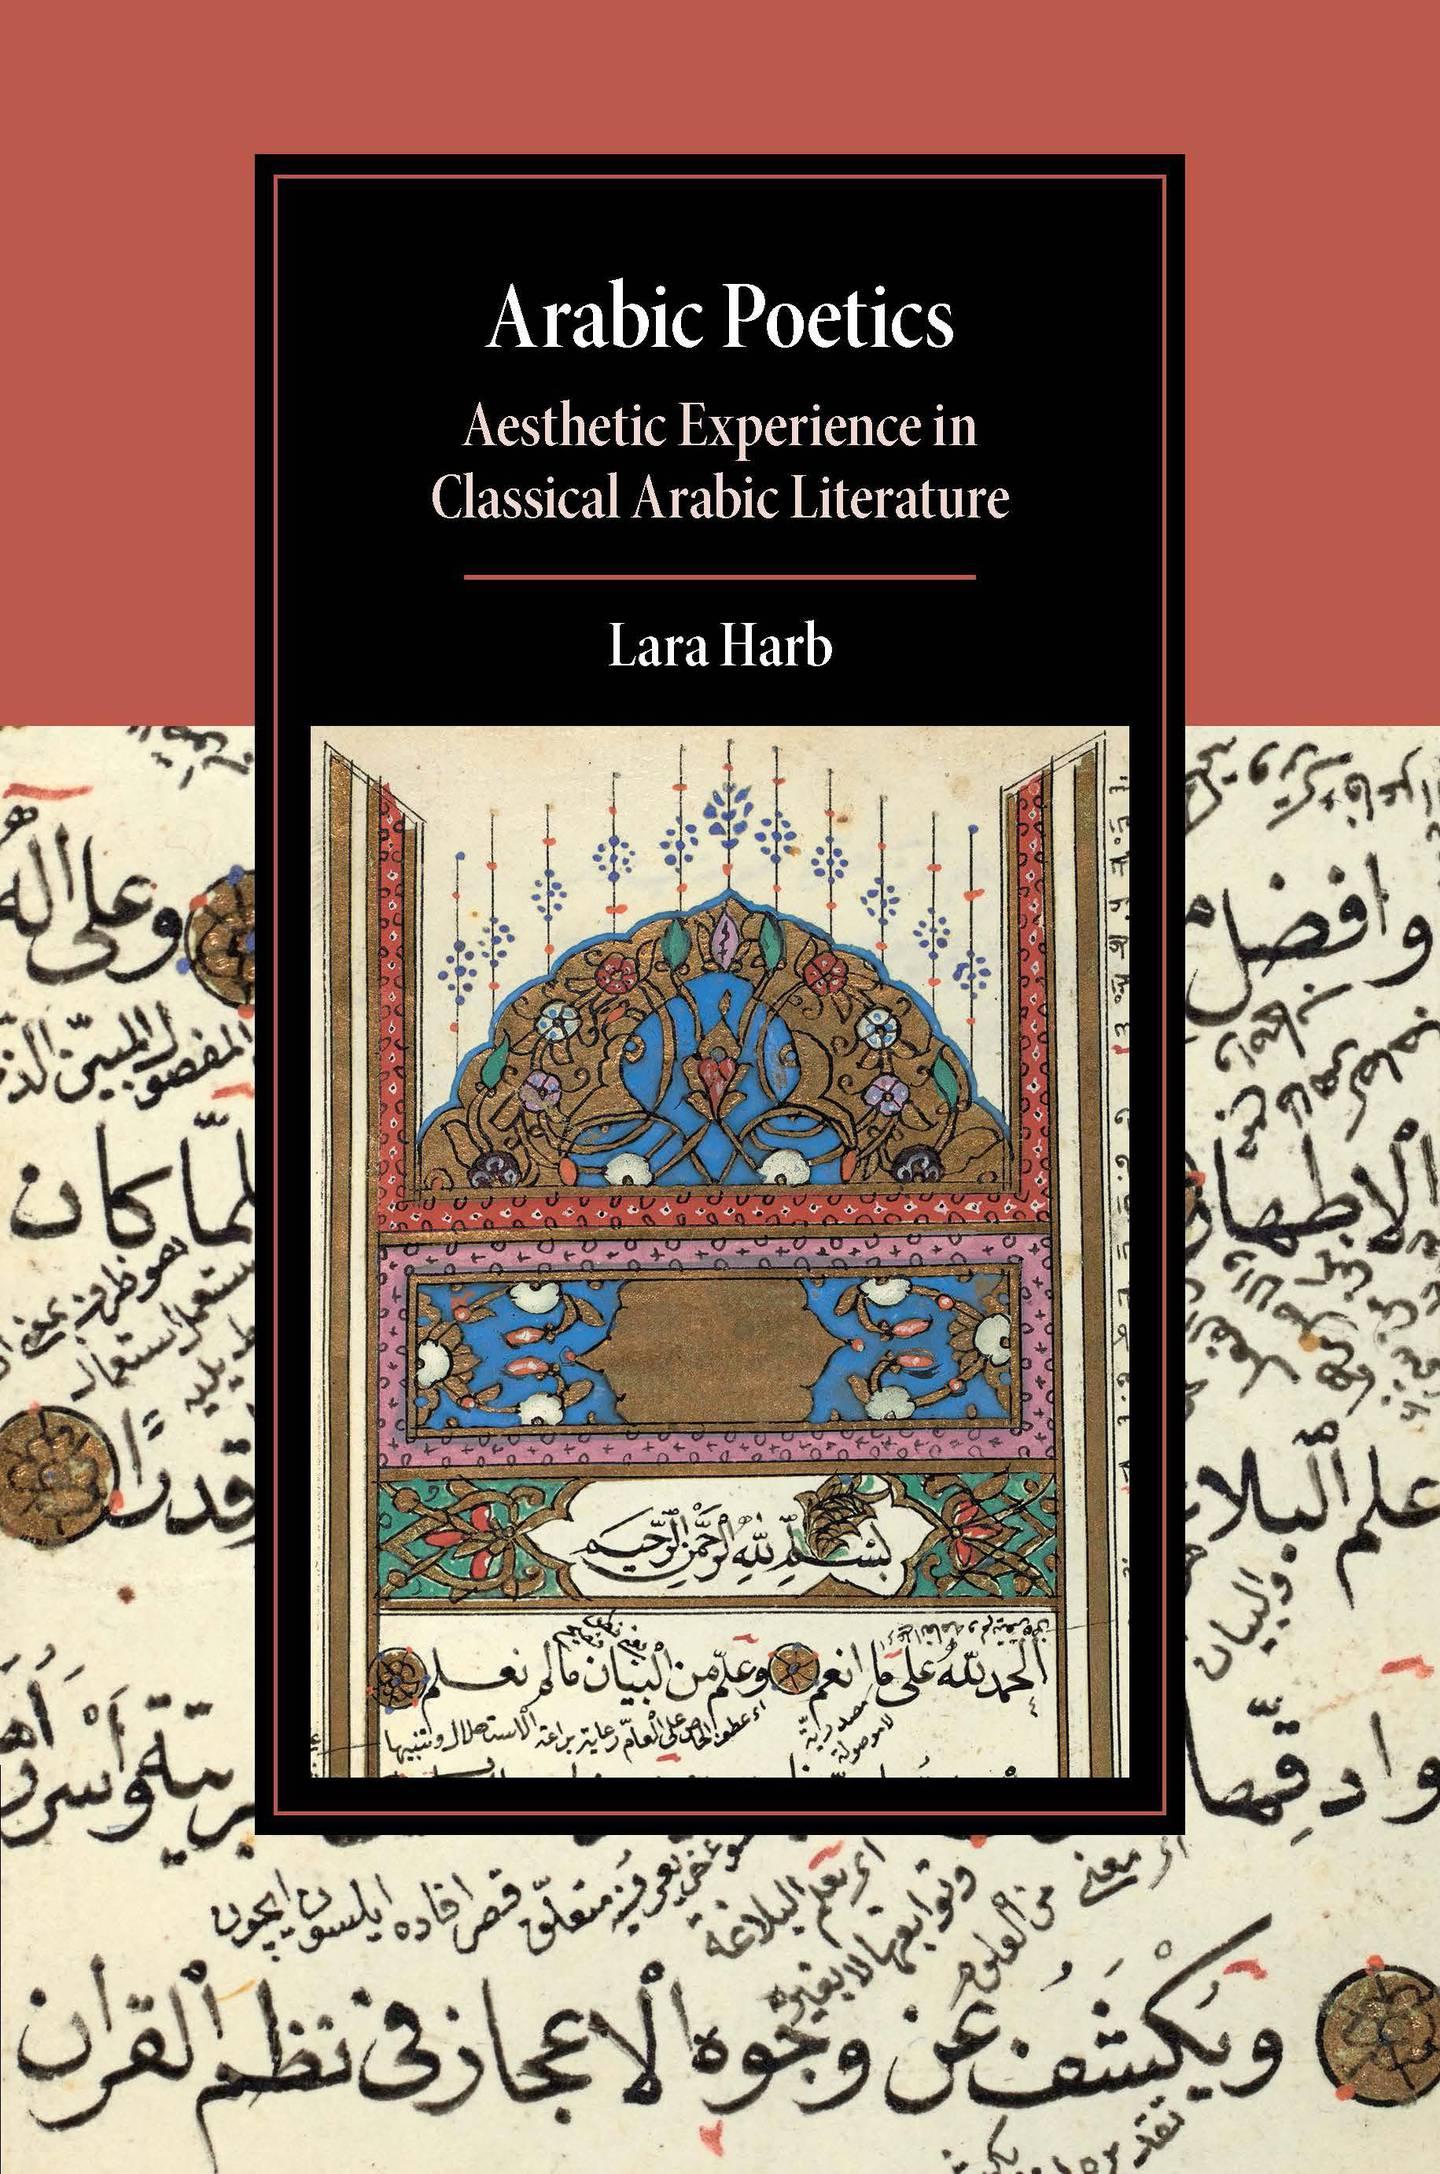 Arabic Poetics: Aesthetic Experience in Classical Arabic Literature by Lara Harb. Courtesy Cambridge University Press